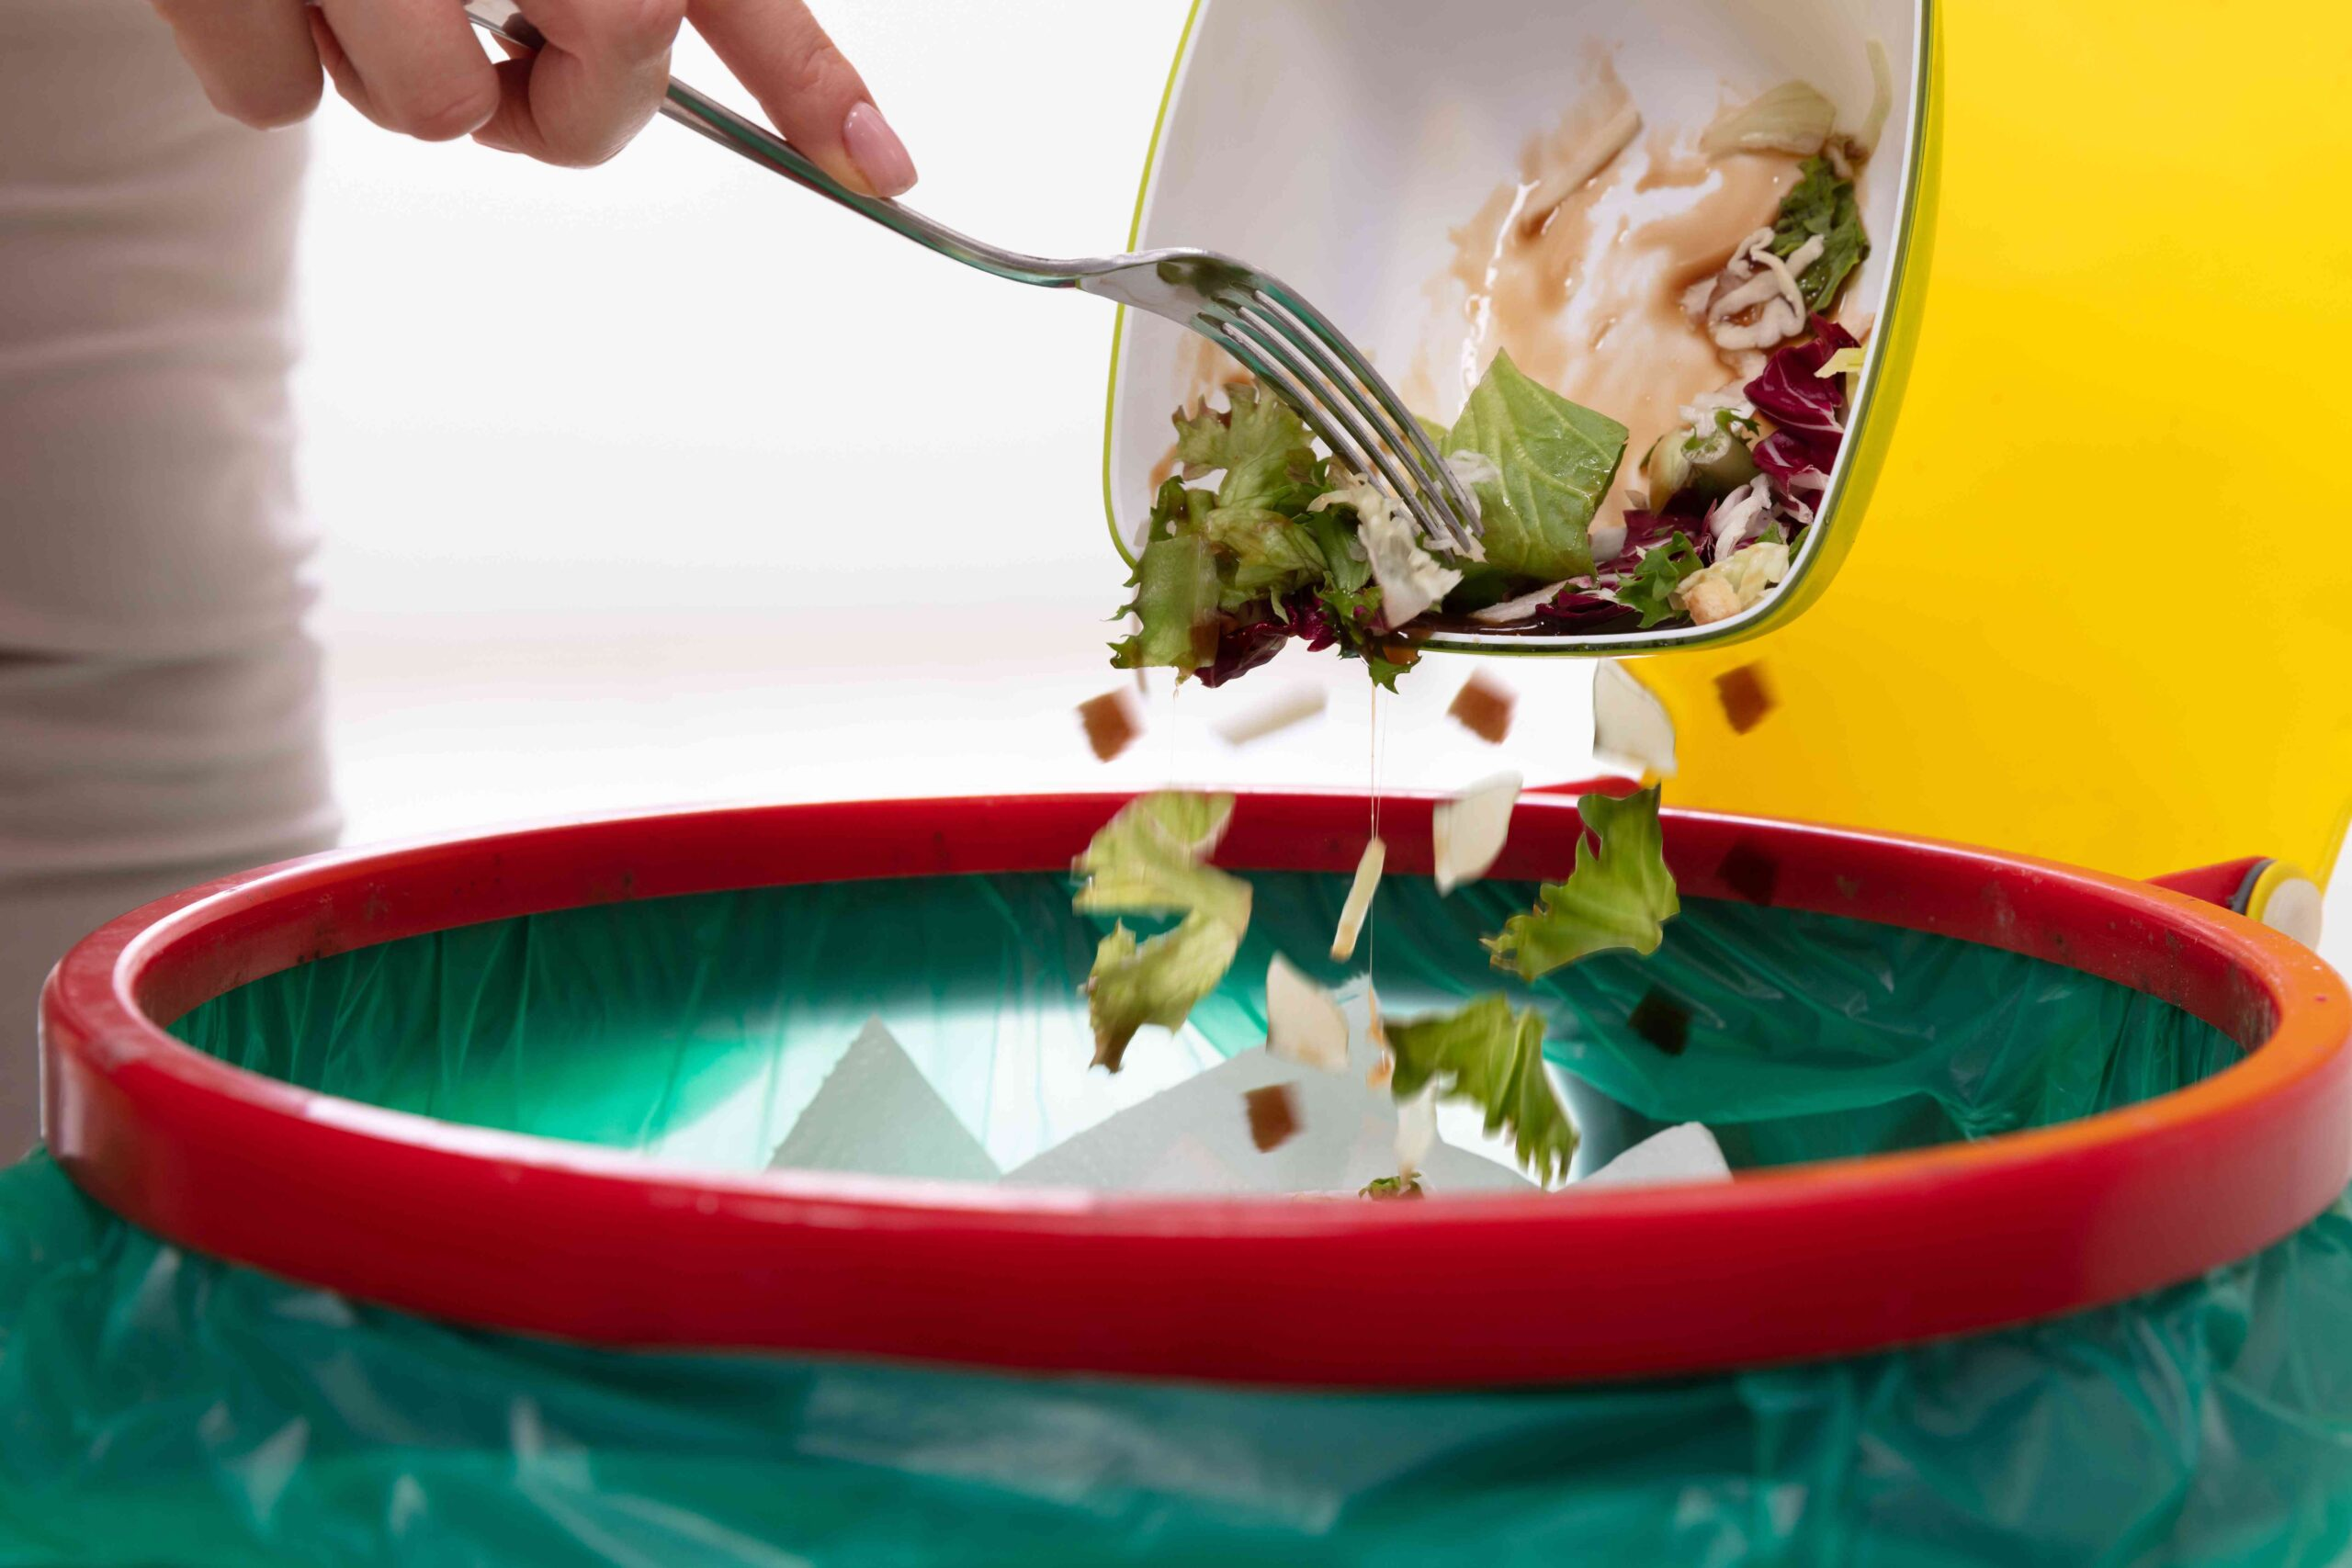 gaspillage de nourriture